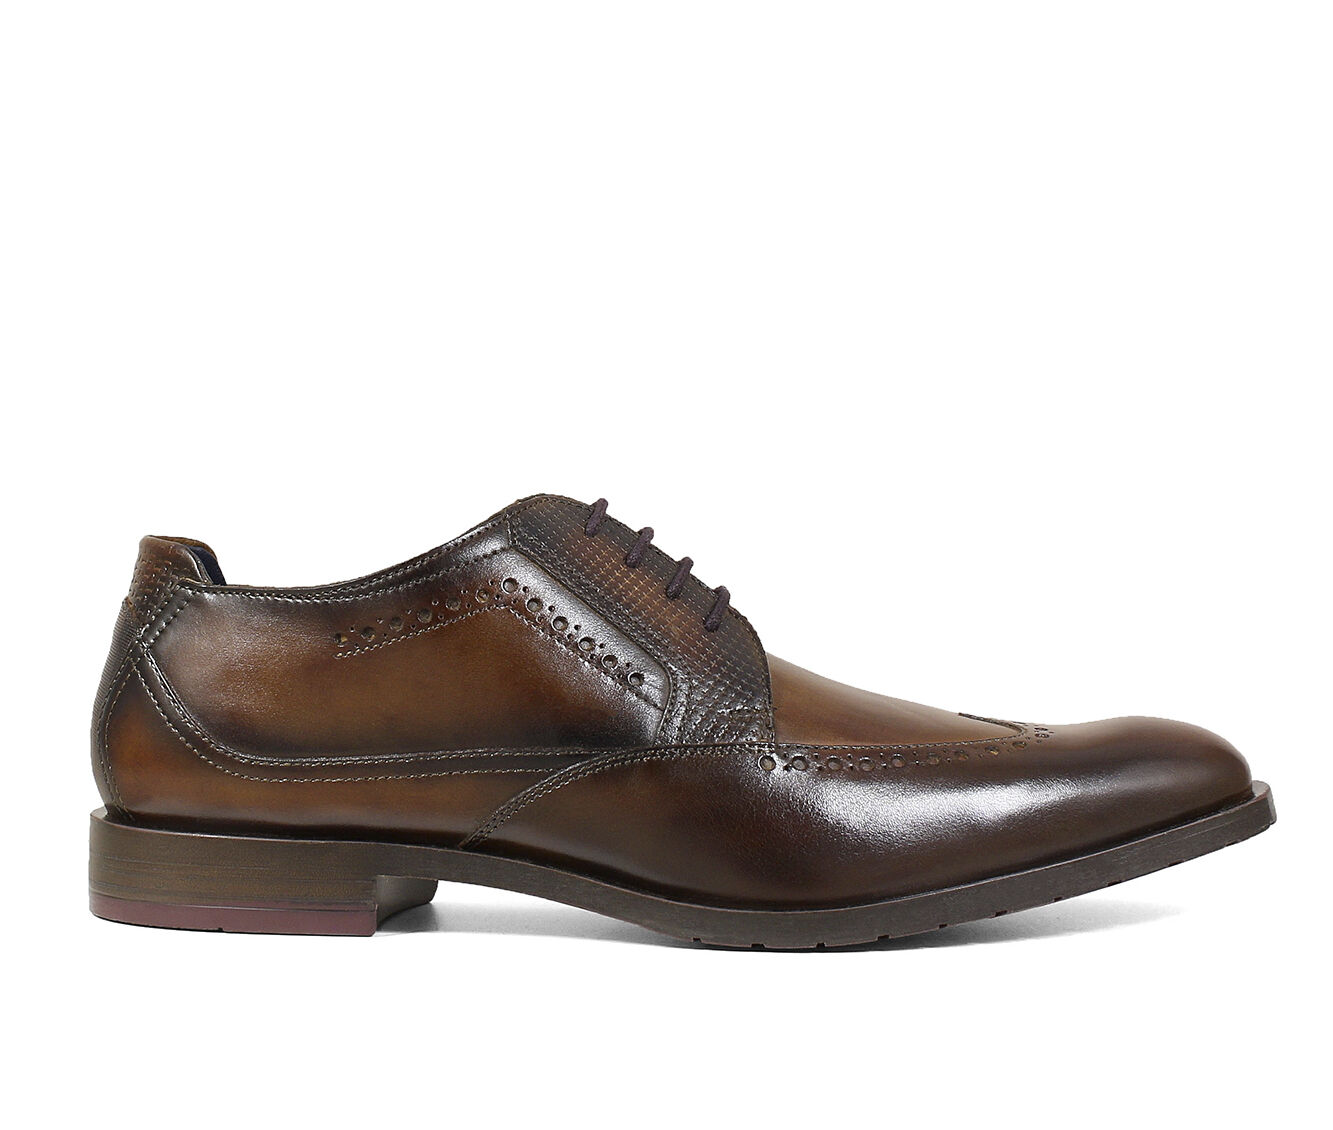 Men's Stacy Adams Rooney Dress Shoes Tan Burgundy